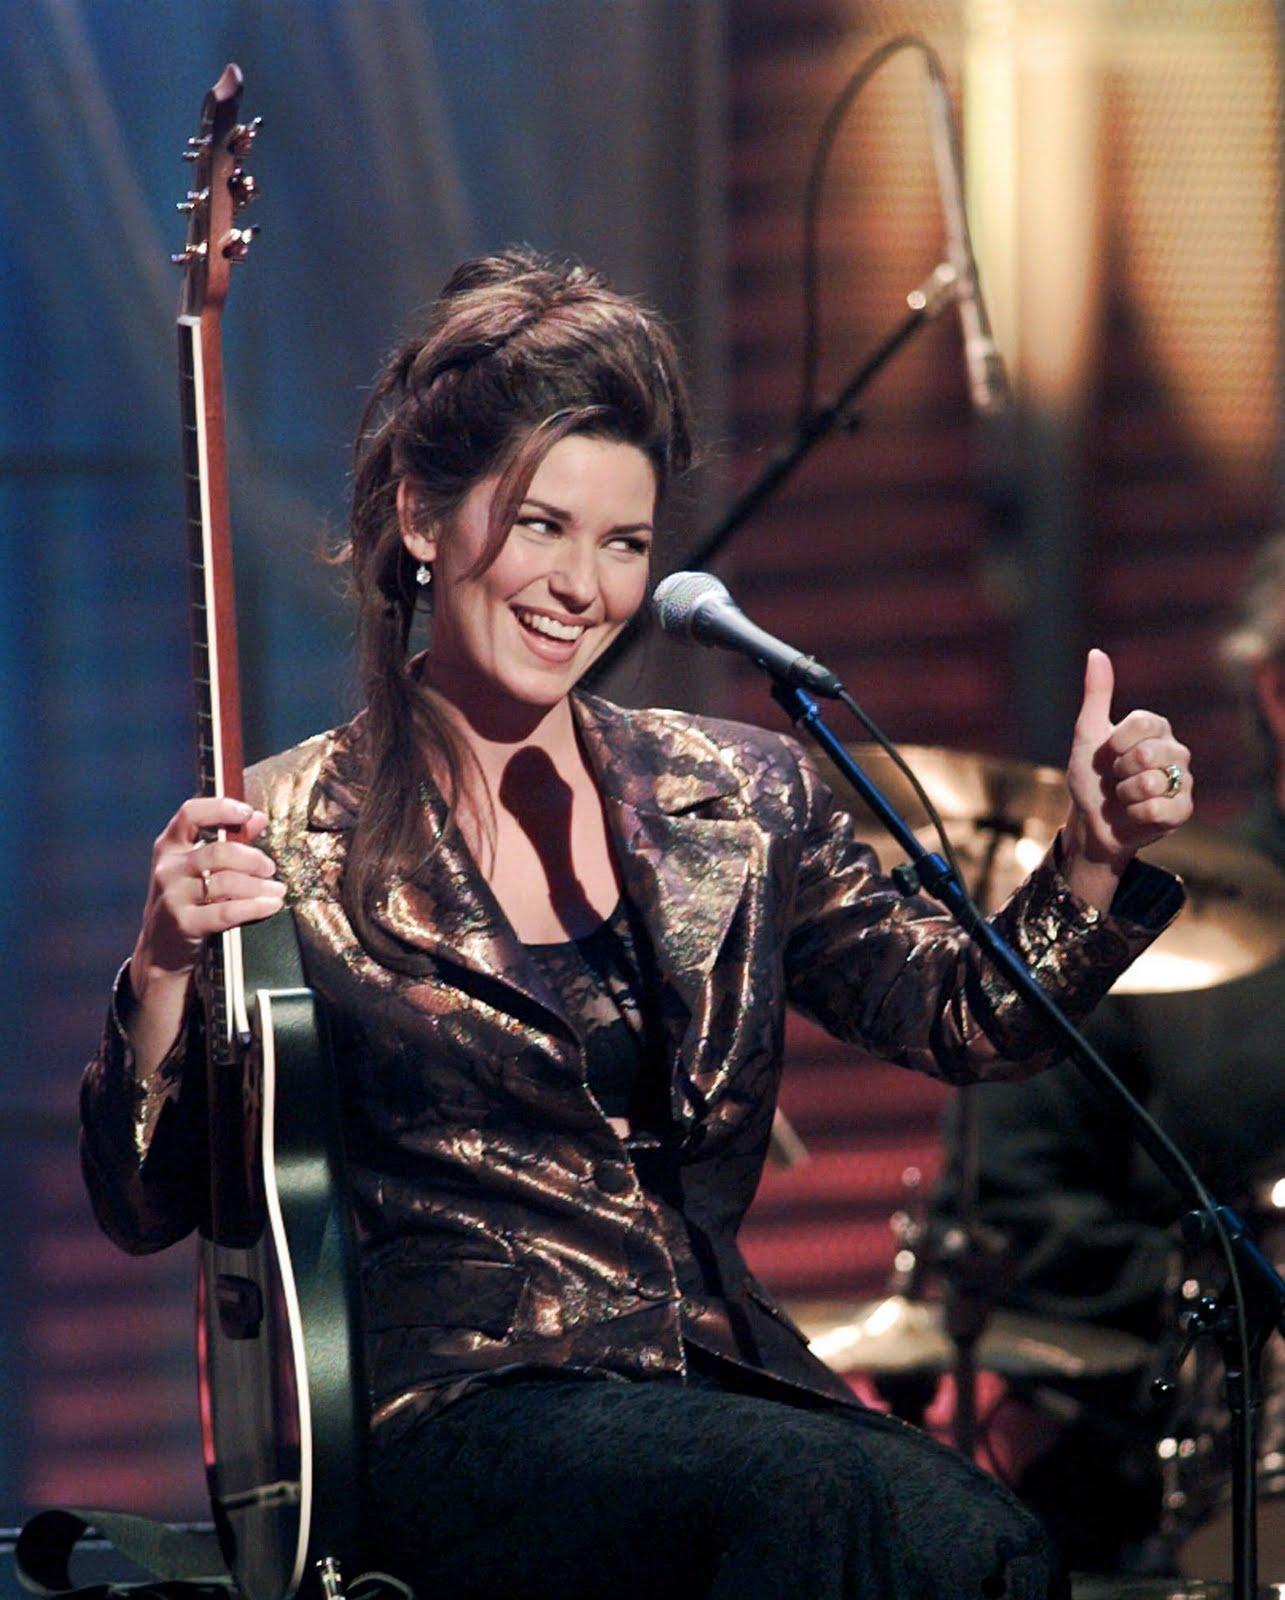 http://1.bp.blogspot.com/-DZLrDZ3P9xA/TlgtuATjgaI/AAAAAAAAOIo/Q9XlkQhWkjc/s1600/Academy-of-Country-Music-Awards-1996-shania-twain-22785533-1596-1988.jpg